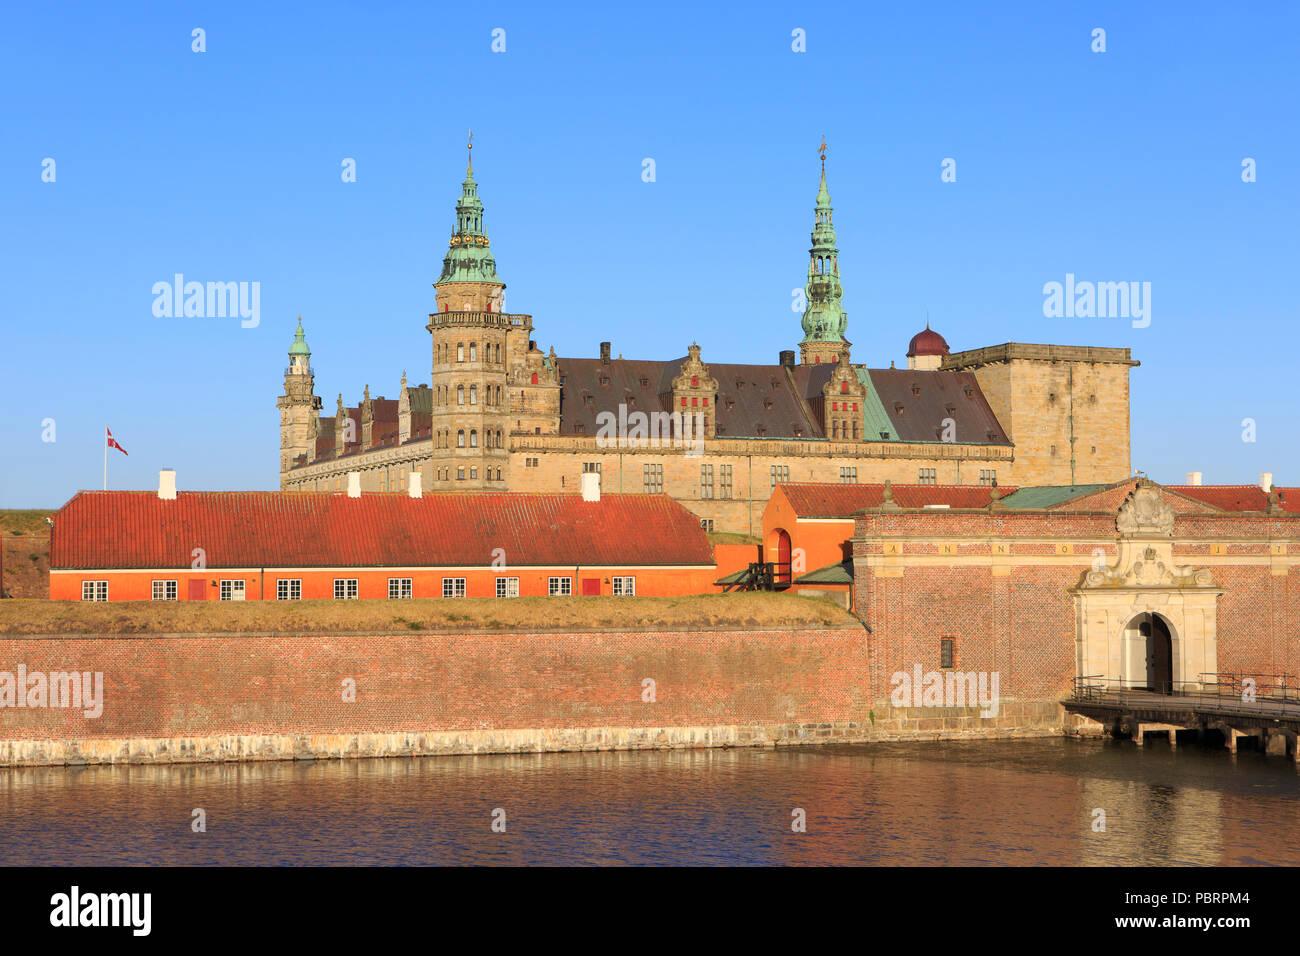 The main entrance of Kronborg Castle (a UNESCO World Heritage Site since 2000) in Helsingor, Denmark - Stock Image